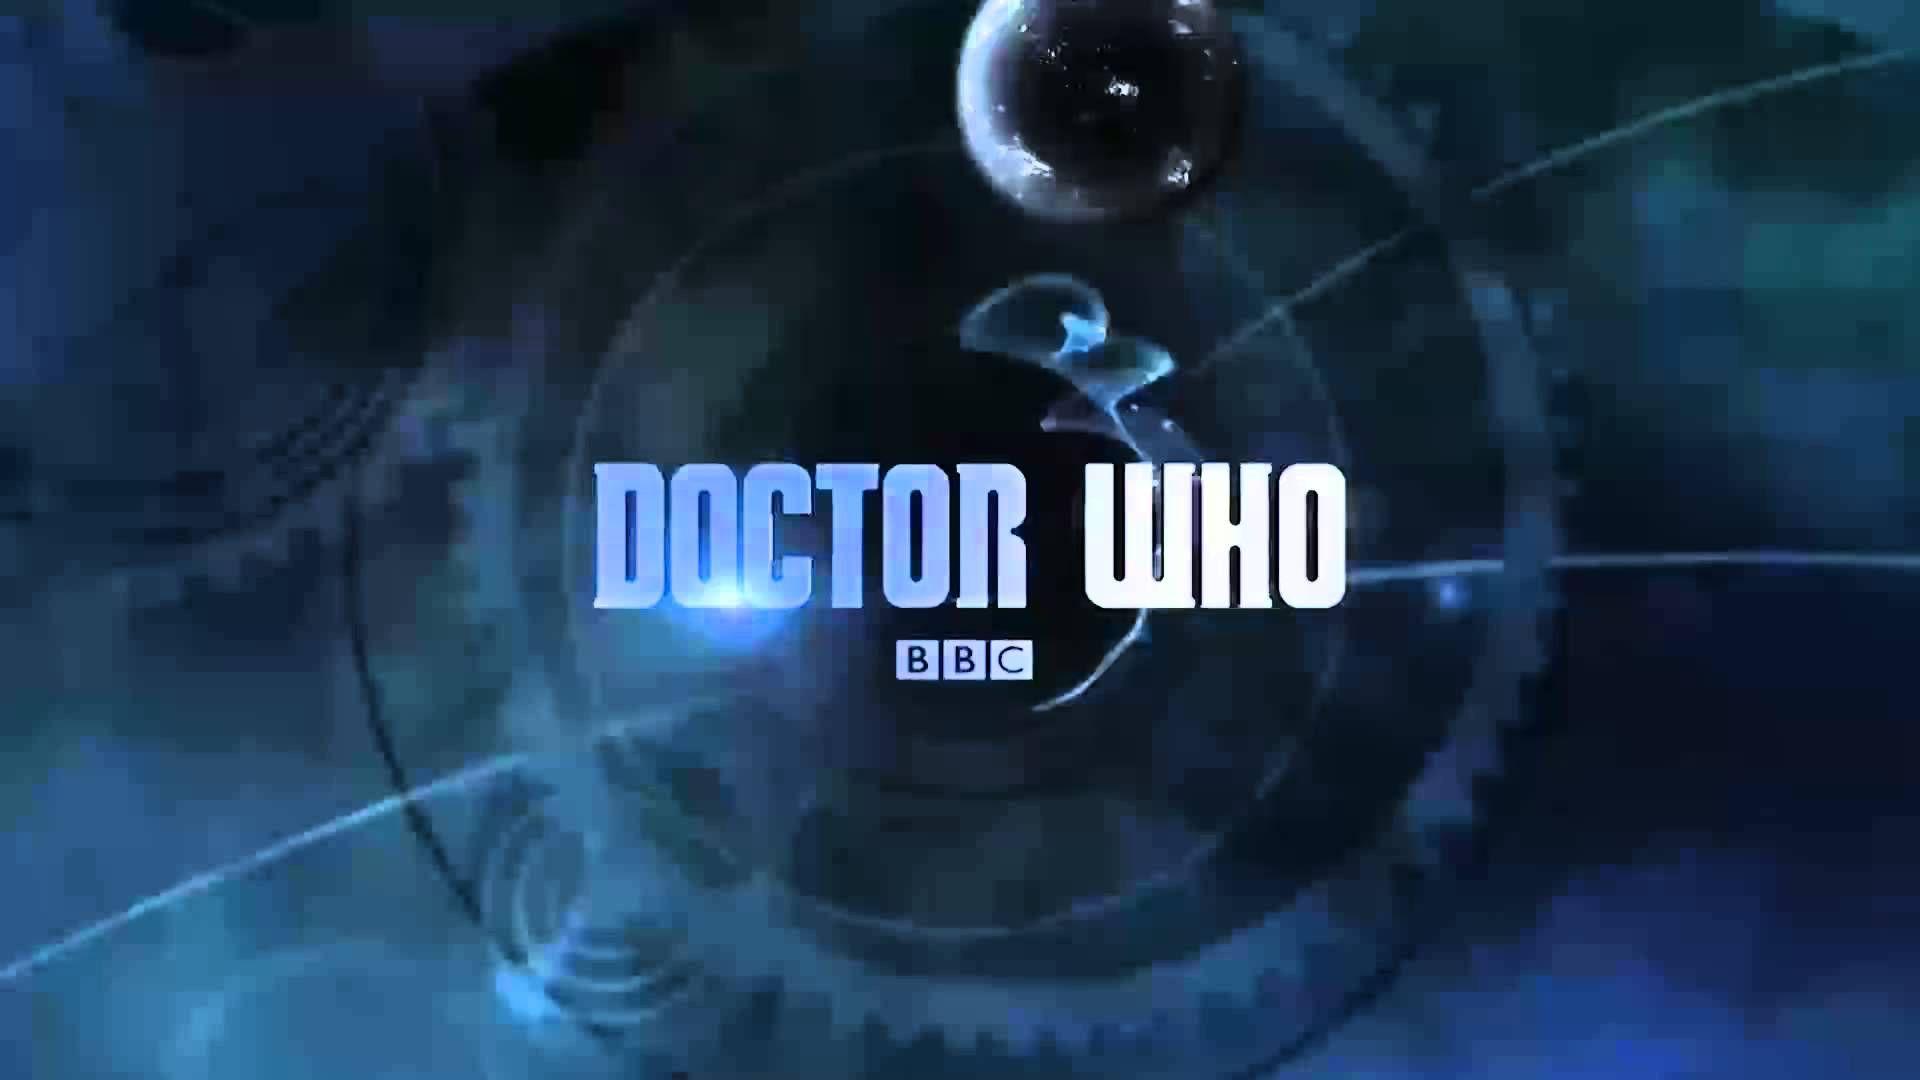 Google themes doctor who - Dr Who Season 9 Google Search